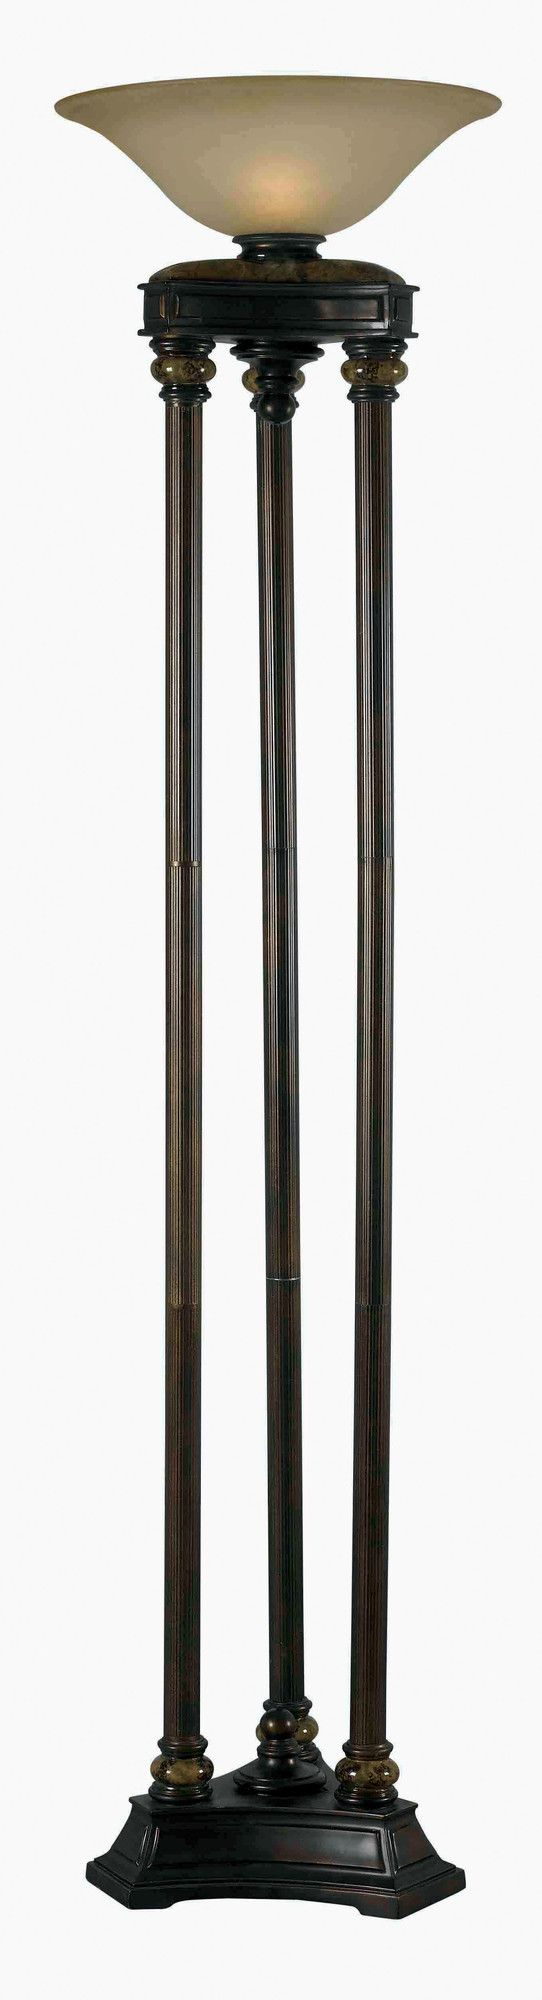 121 best Floor Lamps images on Pinterest | Flooring, Floors and ...